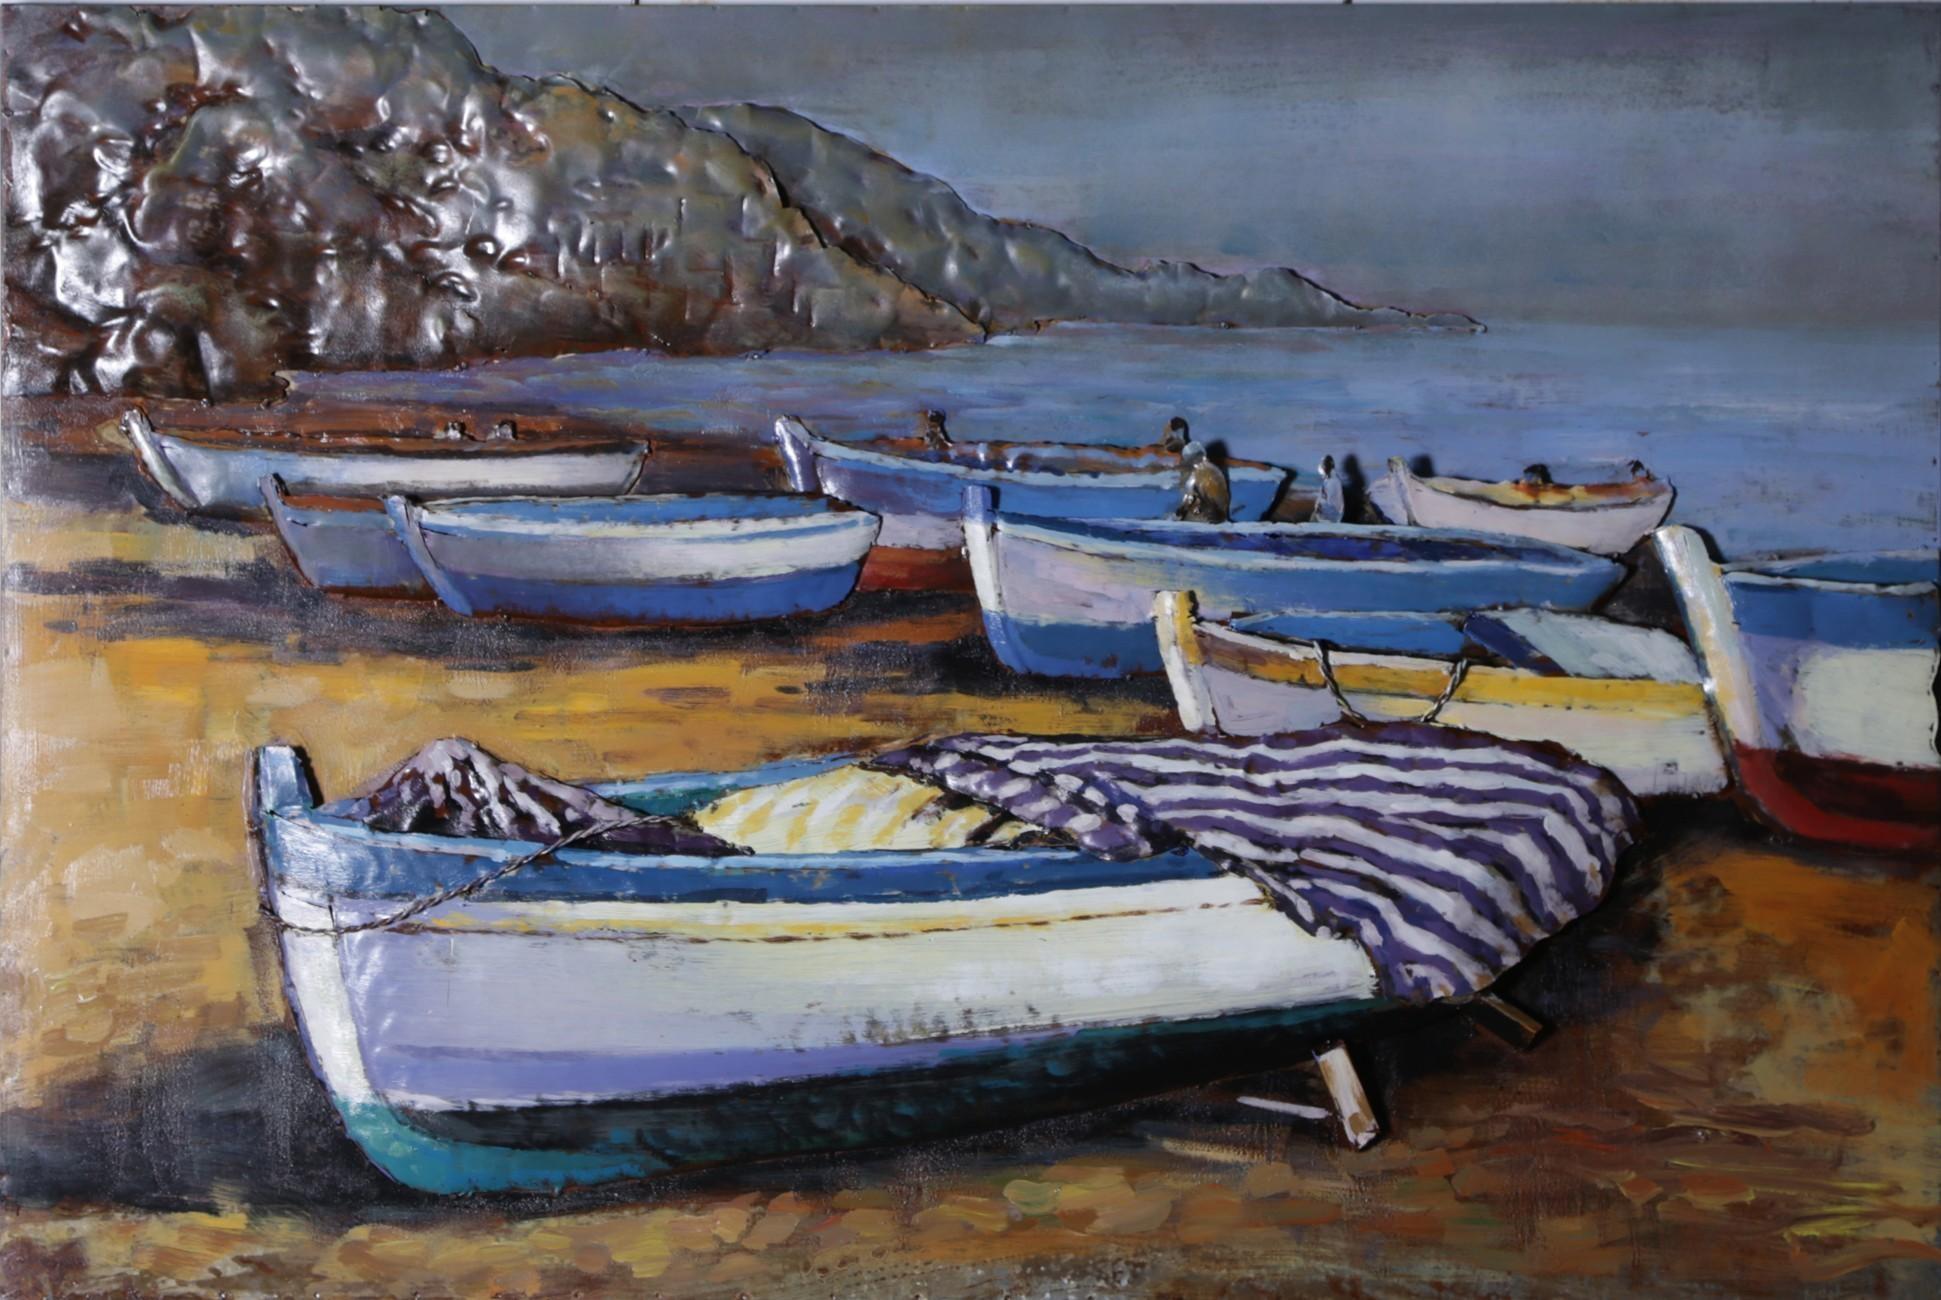 Seaside Boats 3D Metal Wall Art – Blackbrook Interiors Within Seaside Metal Wall Art (View 14 of 20)